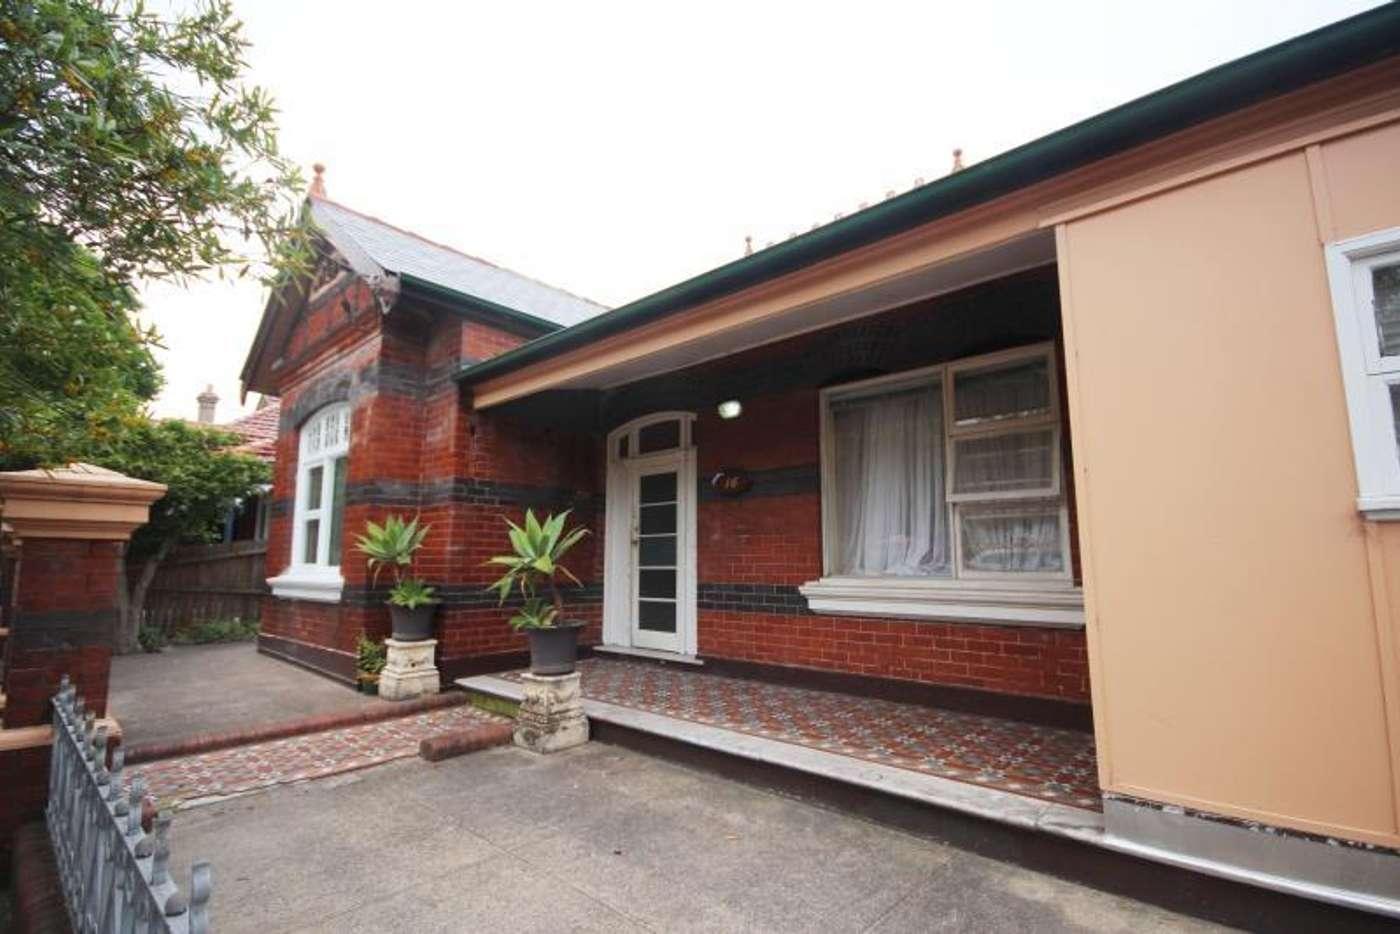 Main view of Homely apartment listing, 2/16 Leichhardt Street, Leichhardt NSW 2040